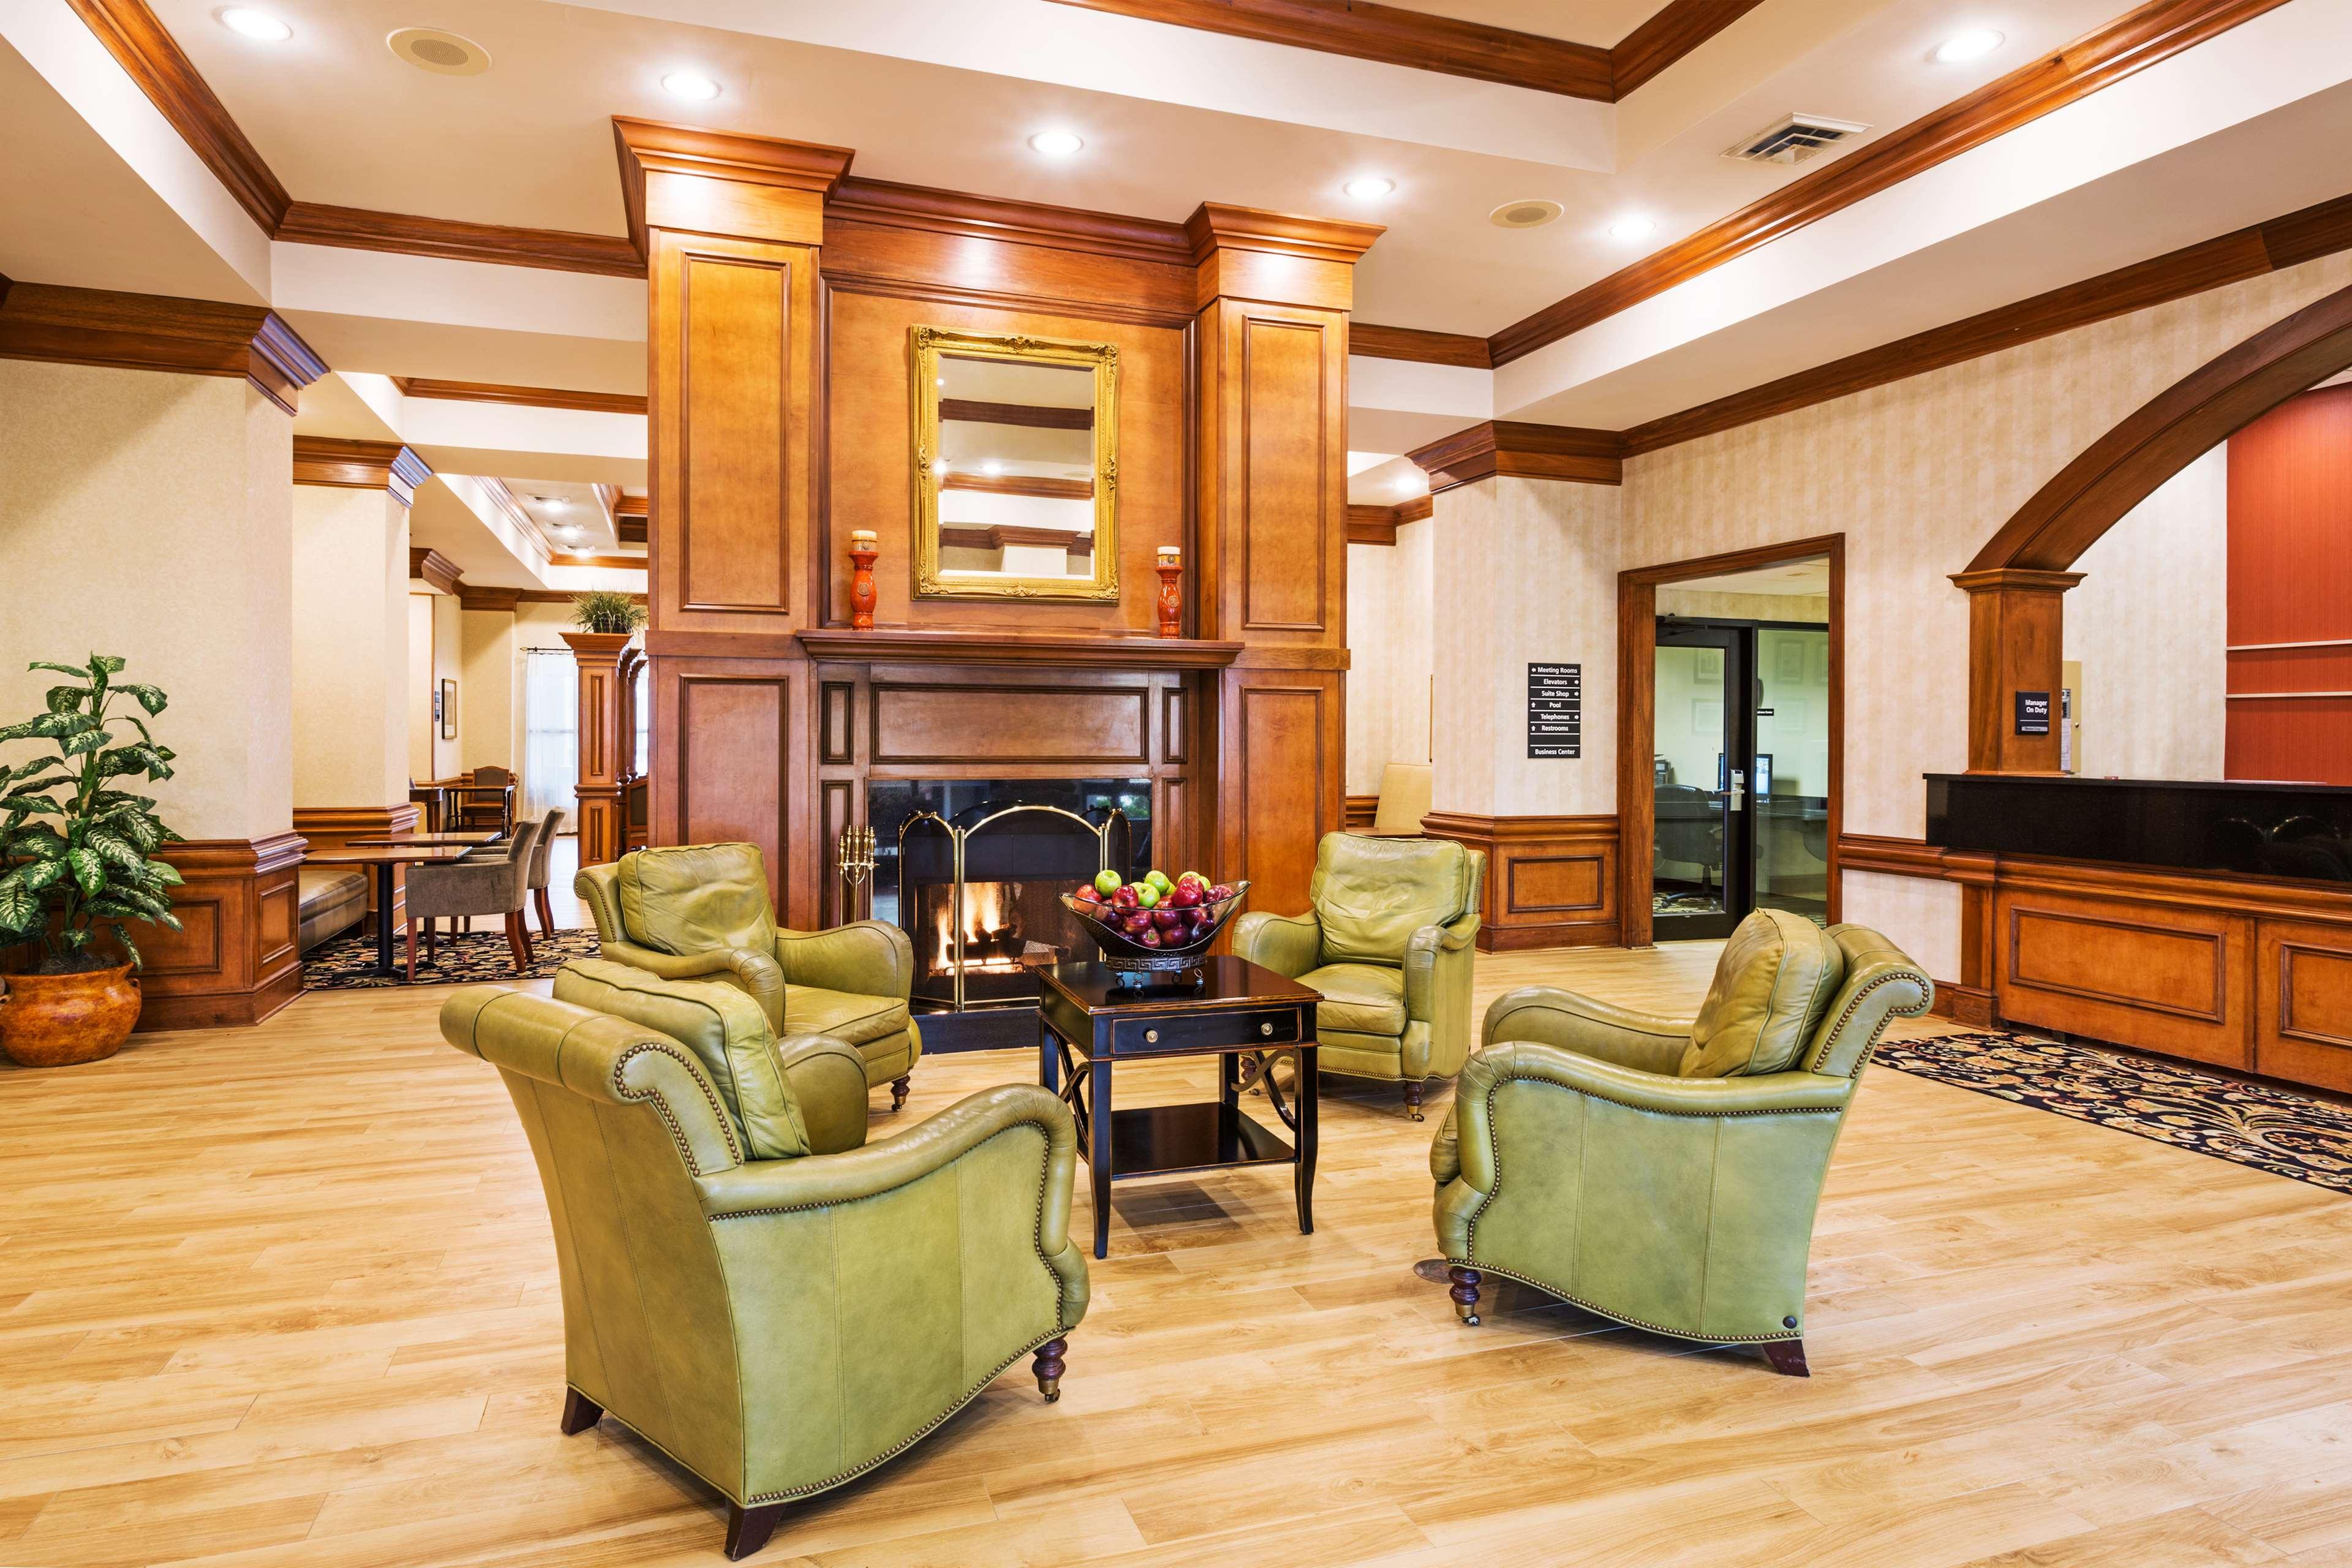 Hampton Inn & Suites Greenville/Spartanburg I-85 image 8